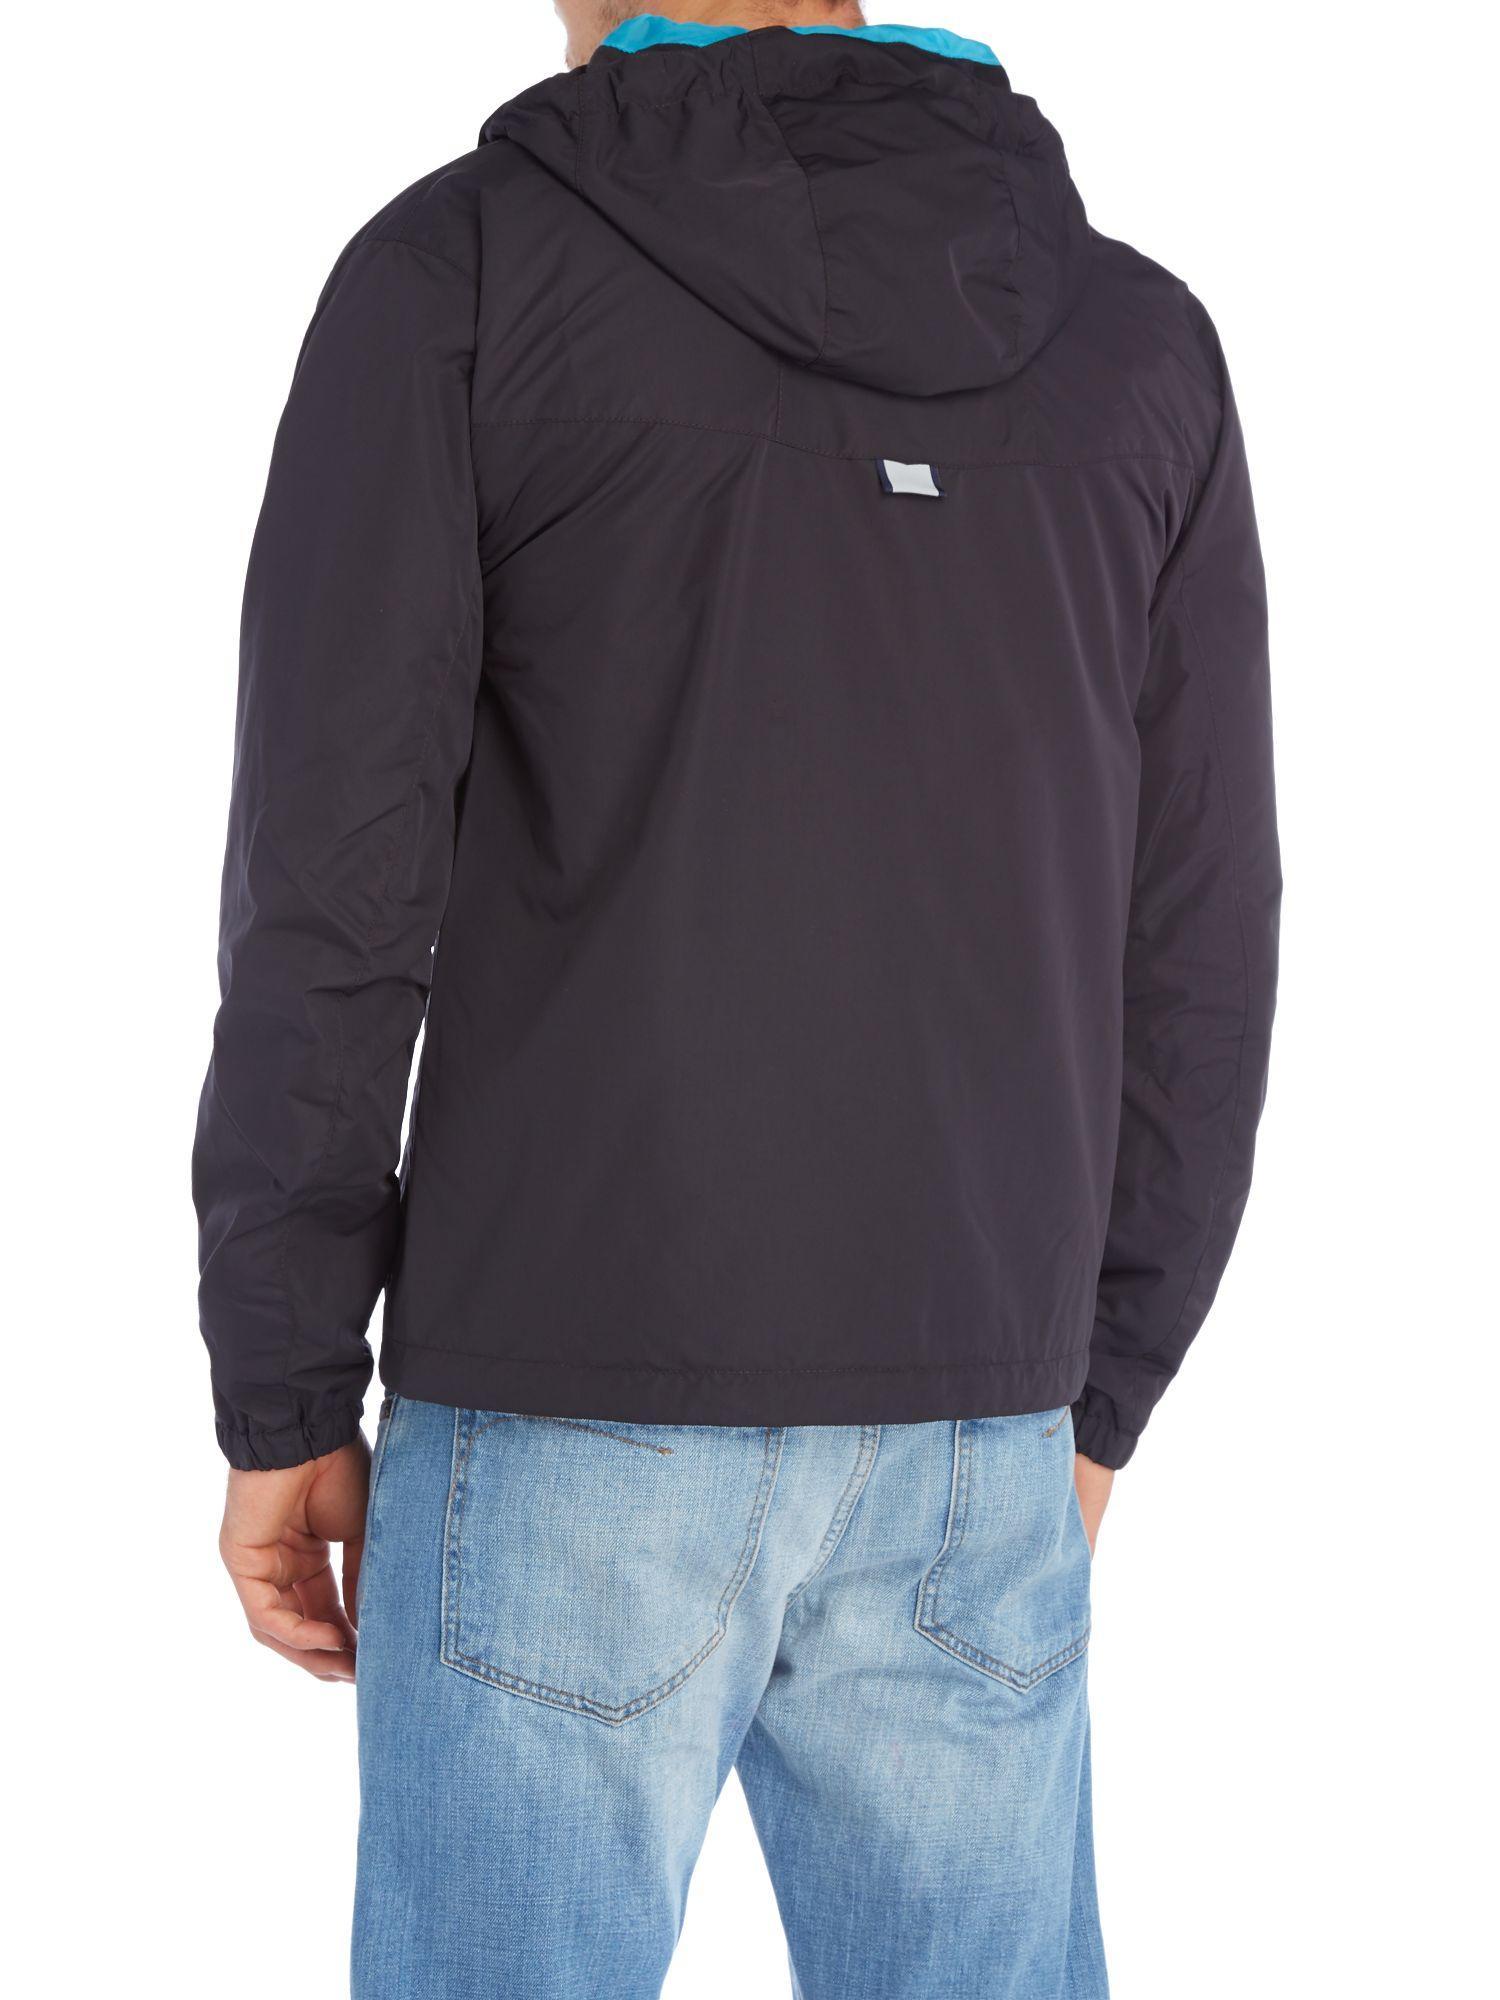 Helly Hansen Marstrand Packable Jacket in Grey (Grey) for Men